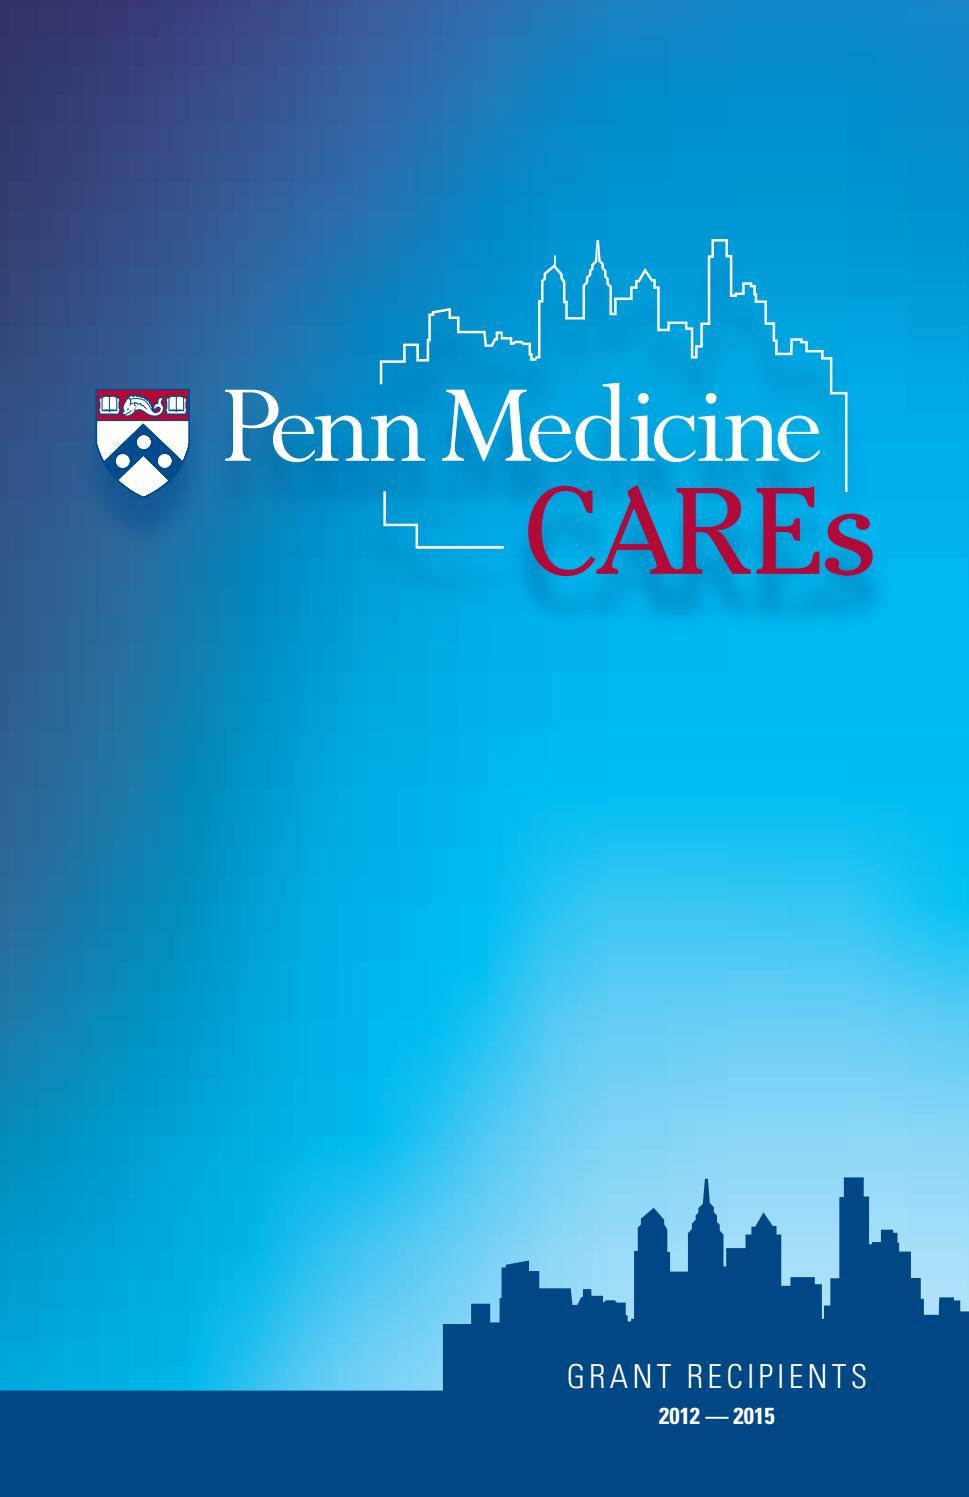 Penn Medicine CAREs | Grant Recipients 2012-2015 by Penn